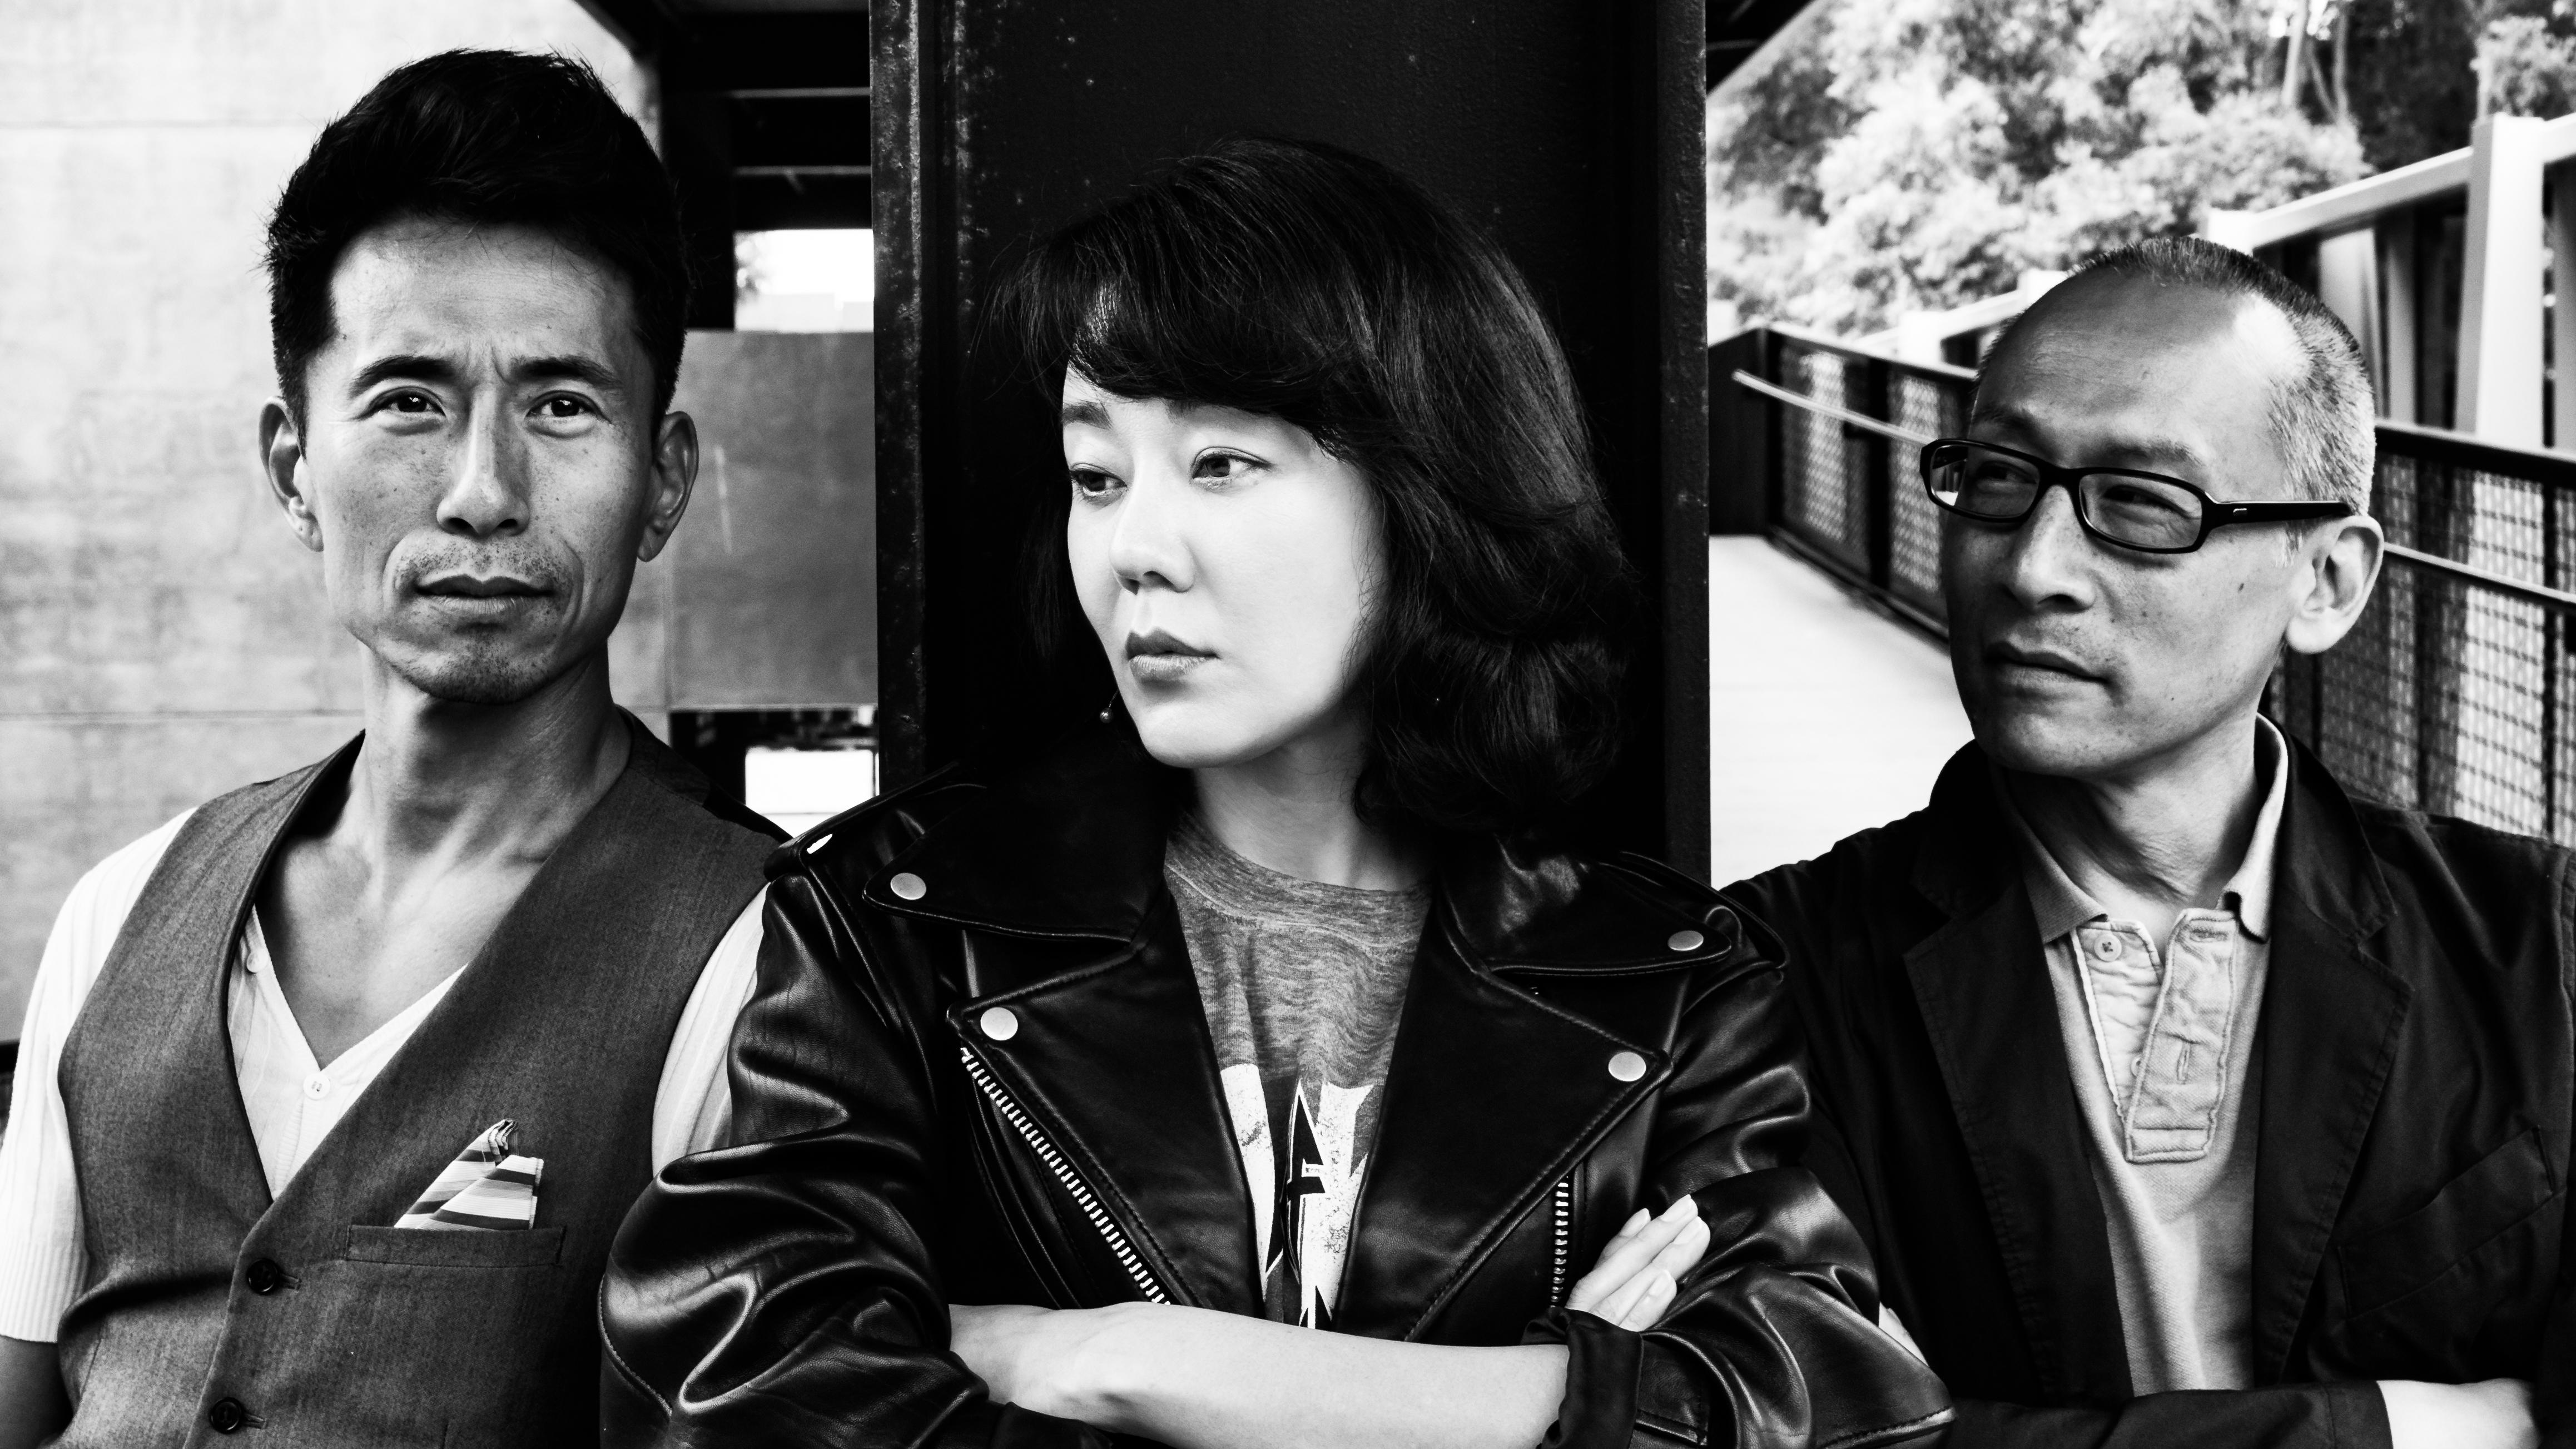 James Kyson, Yunjin Kim, and Francis Jue of WILD GOOSE DREAMS